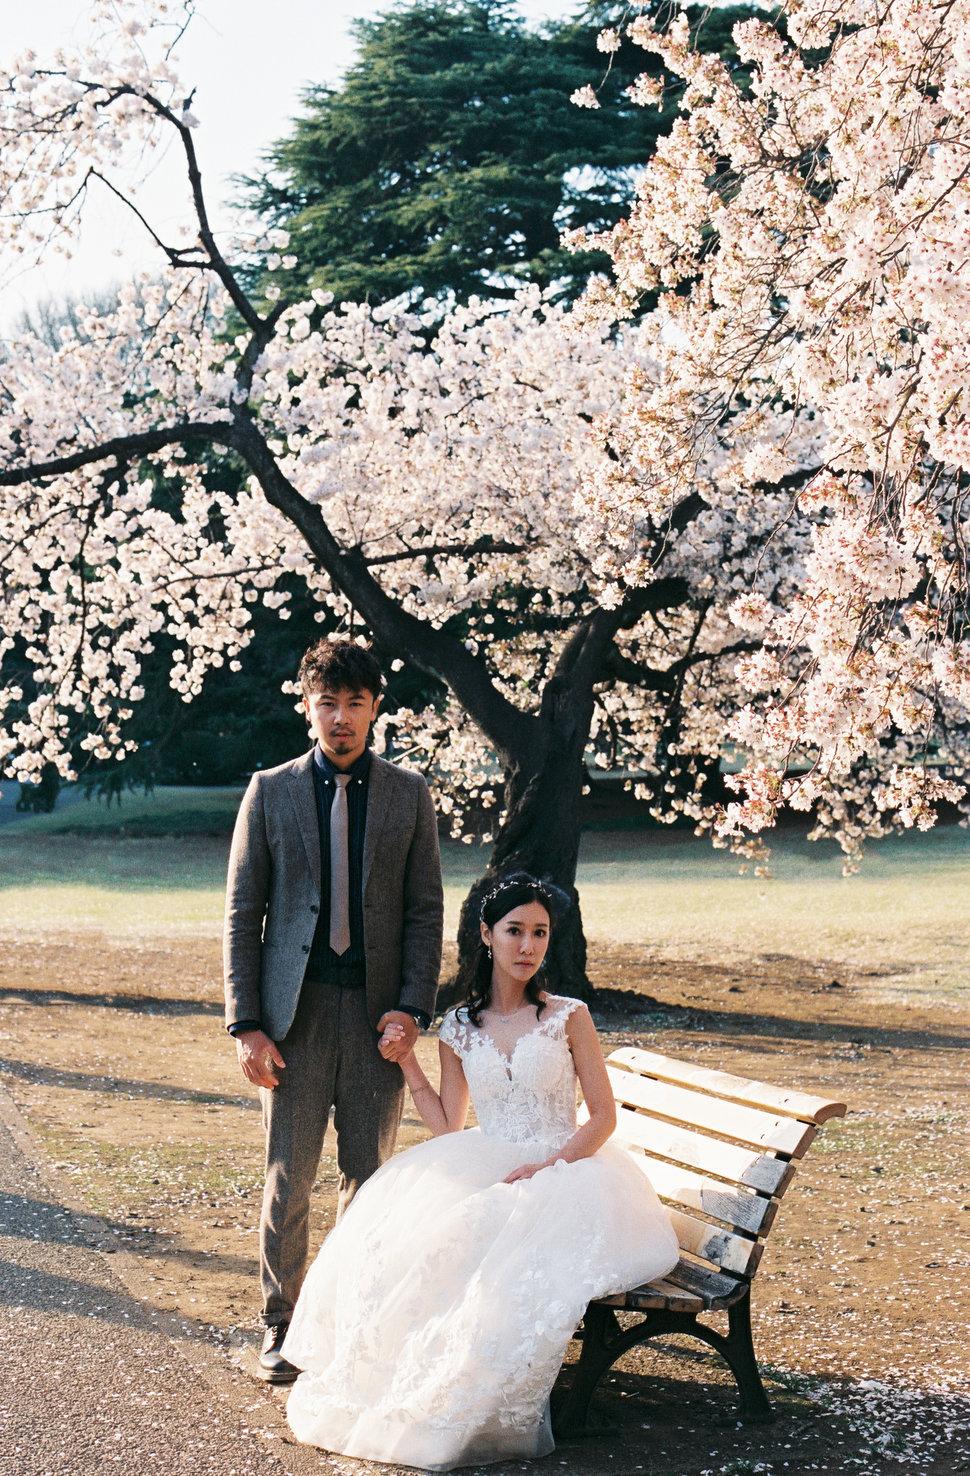 CNV000029 - All Good Wedding - 結婚吧